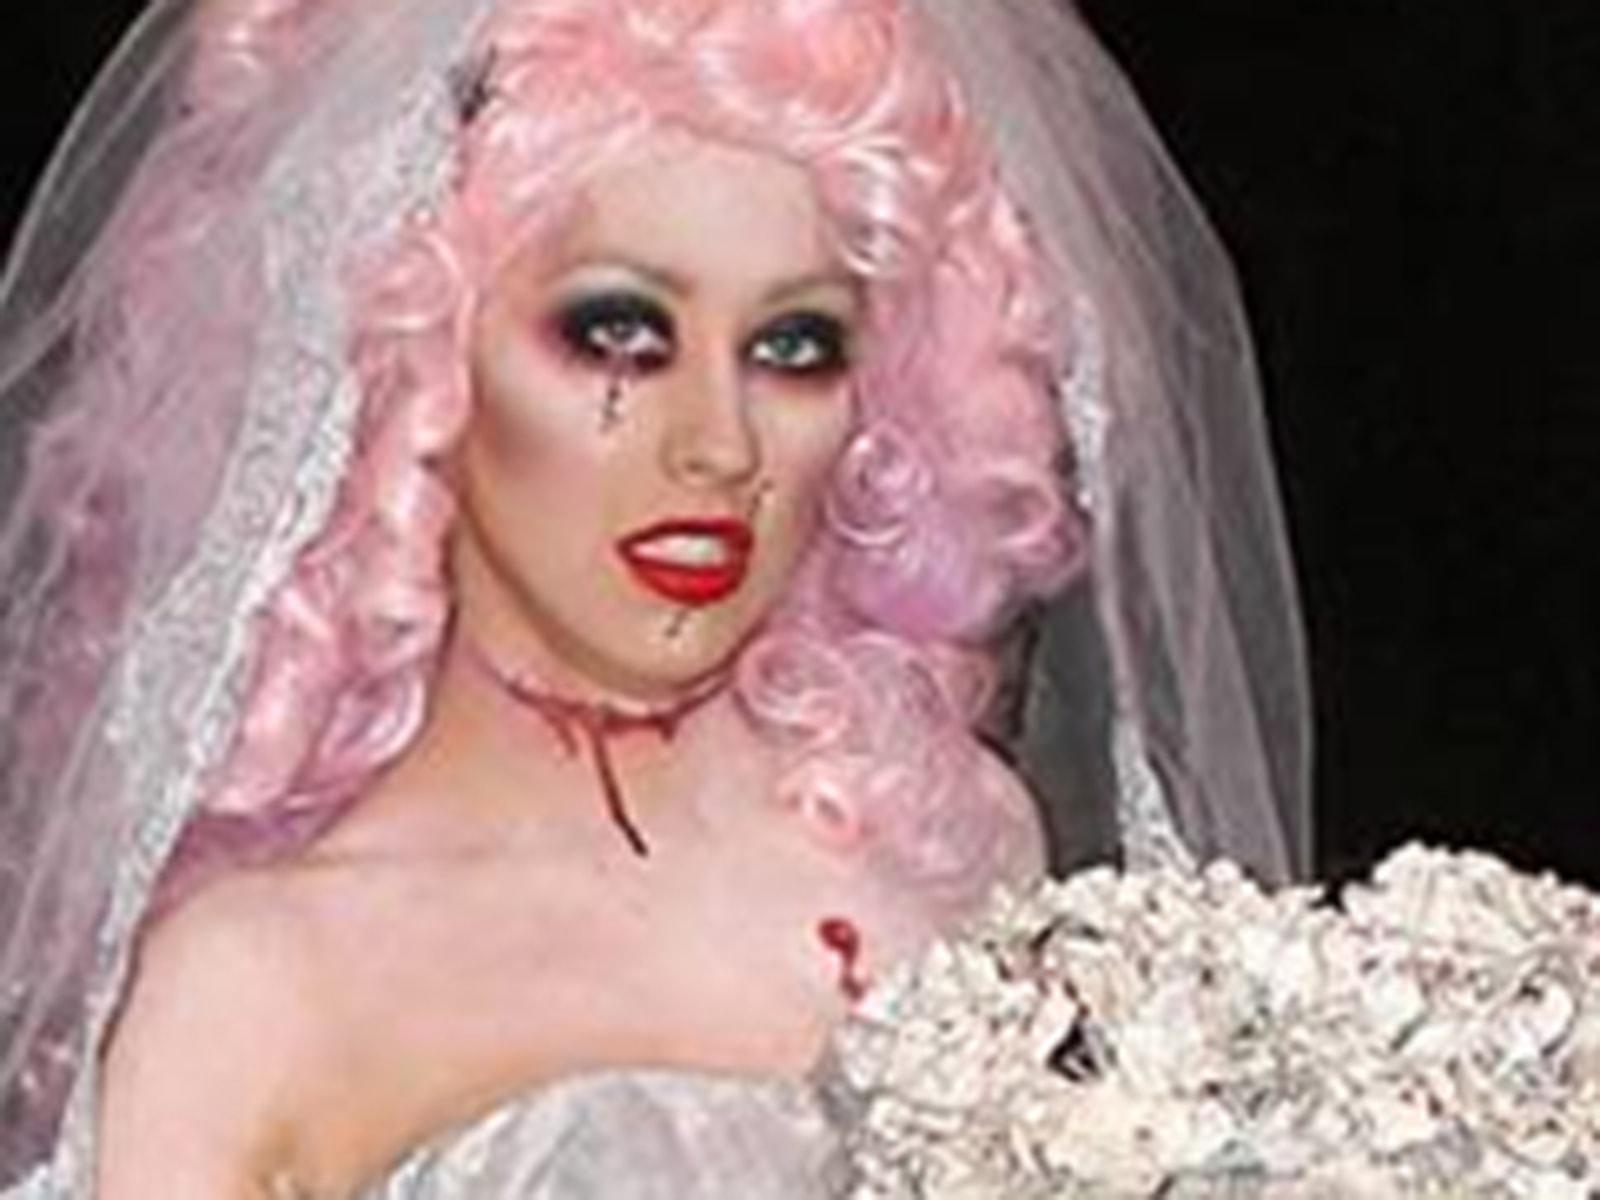 Image: Christina Aguilera as a corpse bride